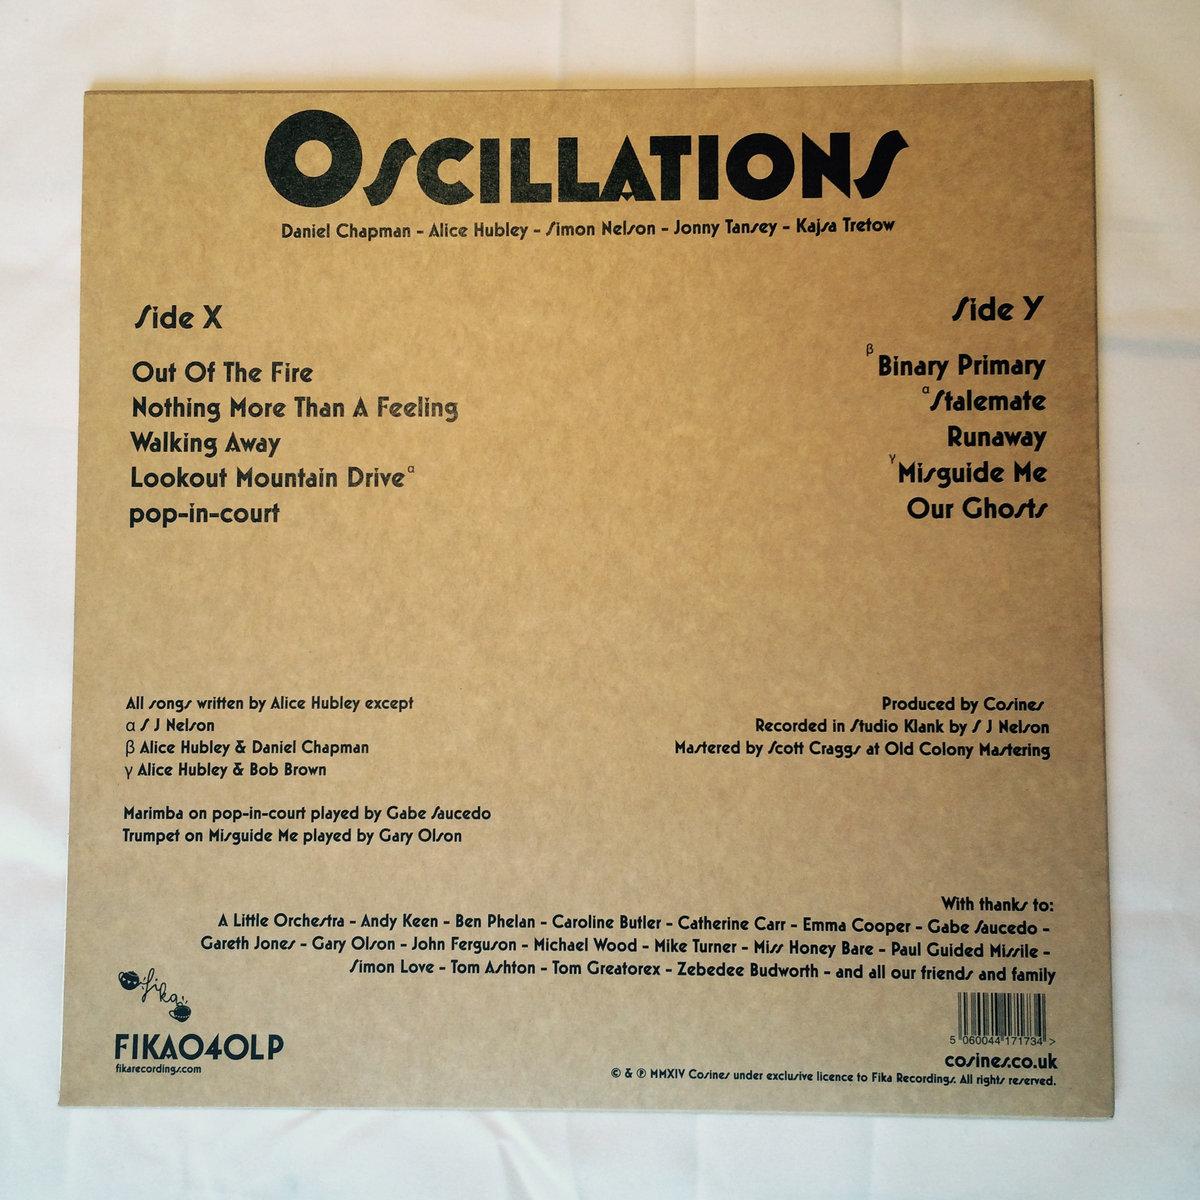 Oscillations | cosines.